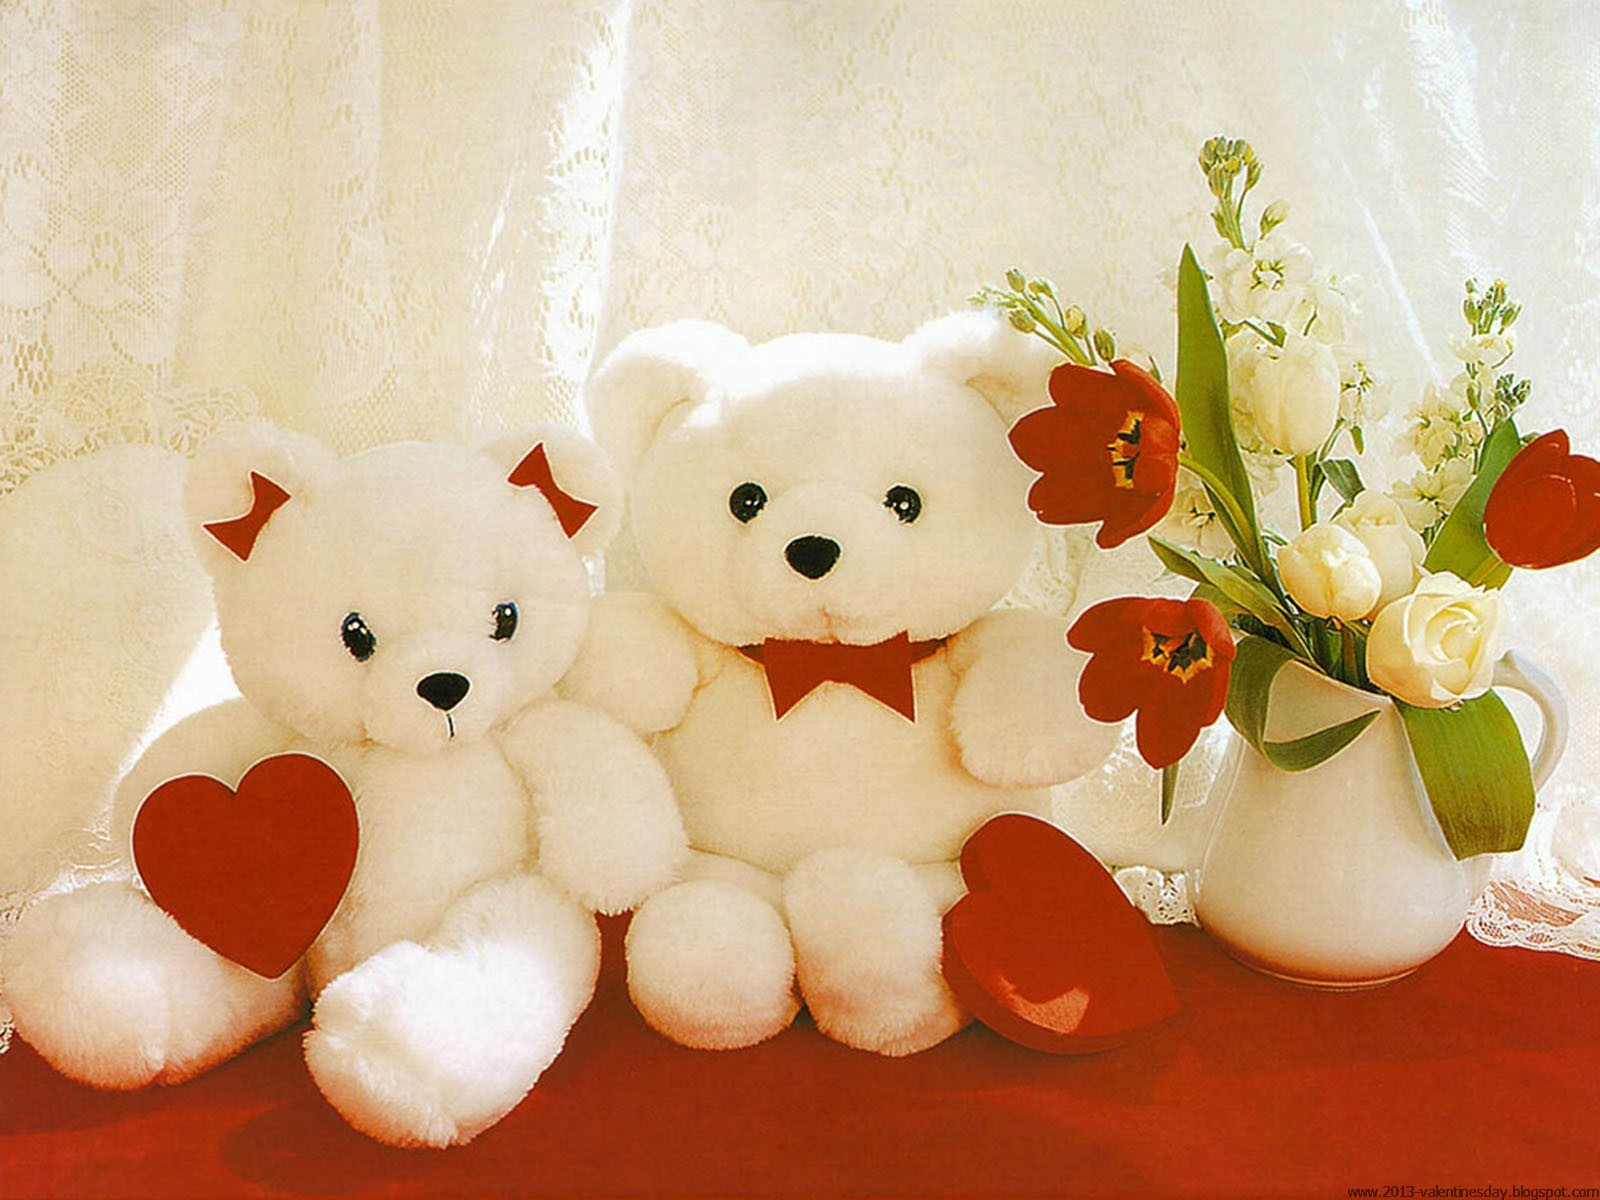 http://4.bp.blogspot.com/-EUSDVeJDvBo/UQ-vjmvO82I/AAAAAAAADXc/z0GUdOH1wwo/s1600/Love%20Teddy%20Bear%20Wallpapers%204.jpg